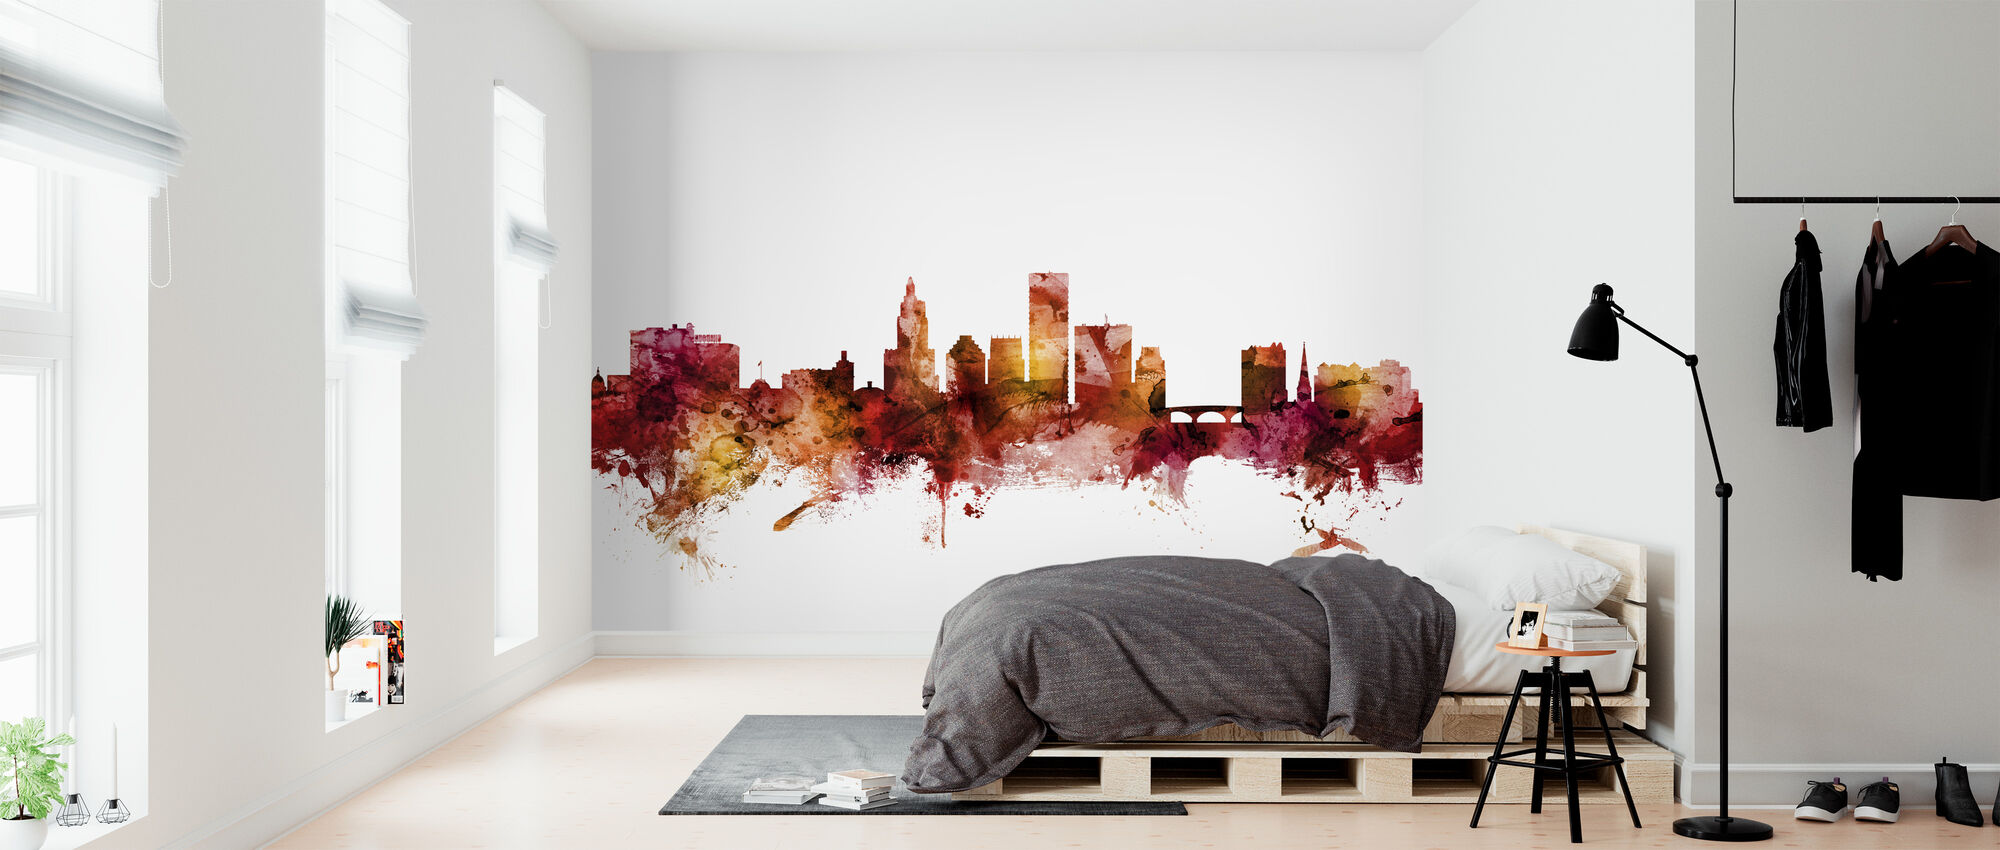 Providence Rhode Island Skyline - Wallpaper - Bedroom